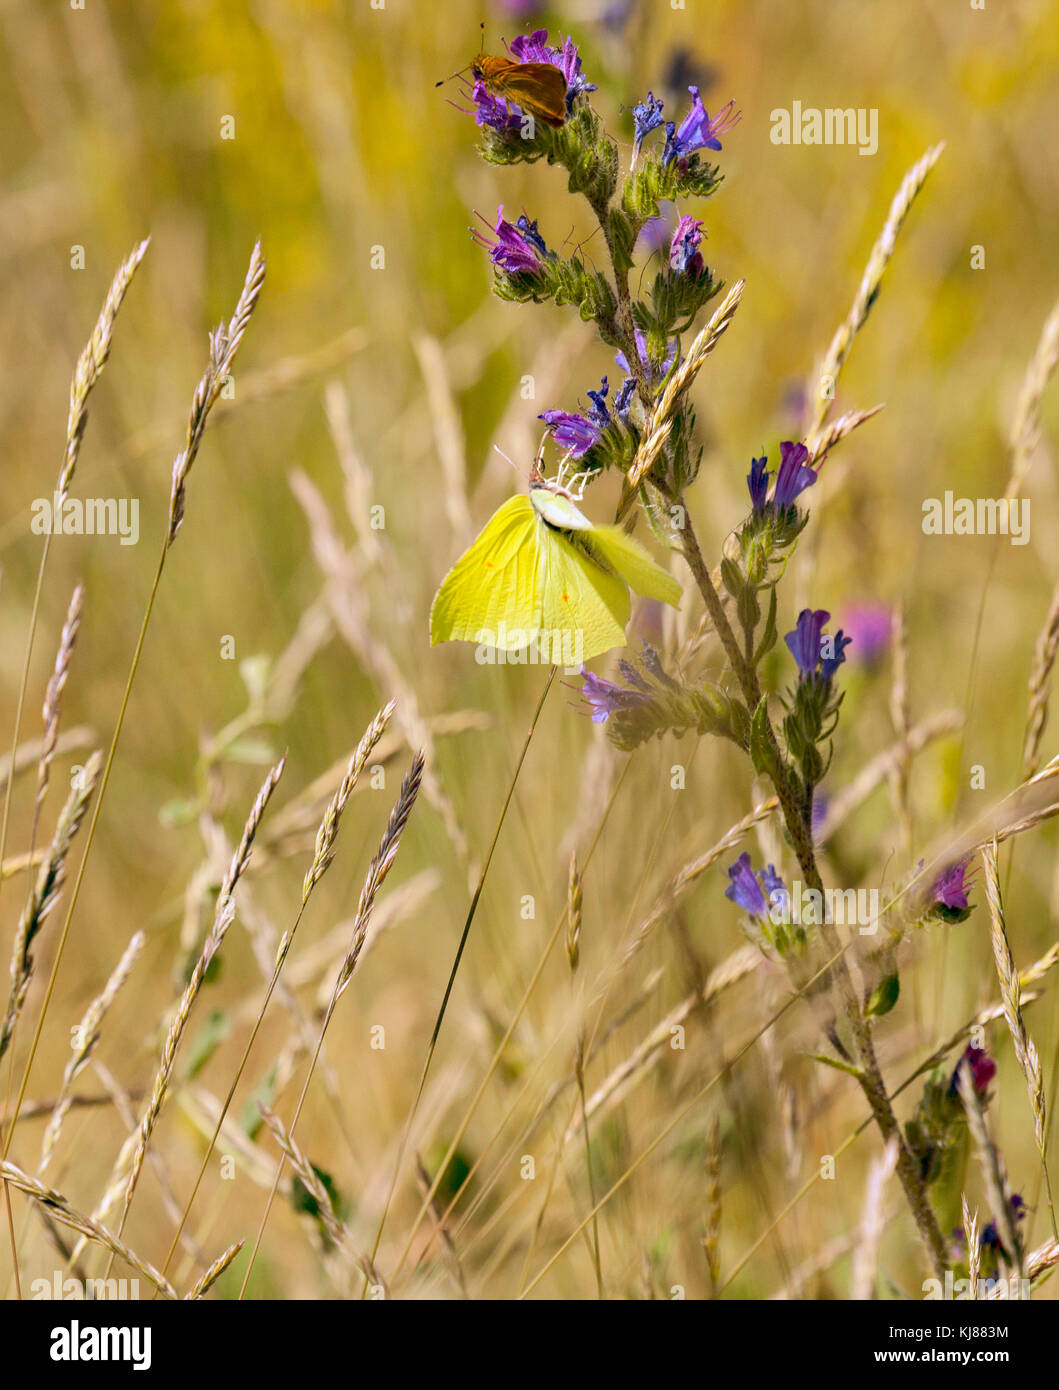 Brimstone butterfly Gonepteryx rhamni on flower head in the English countryside England UK Stock Photo